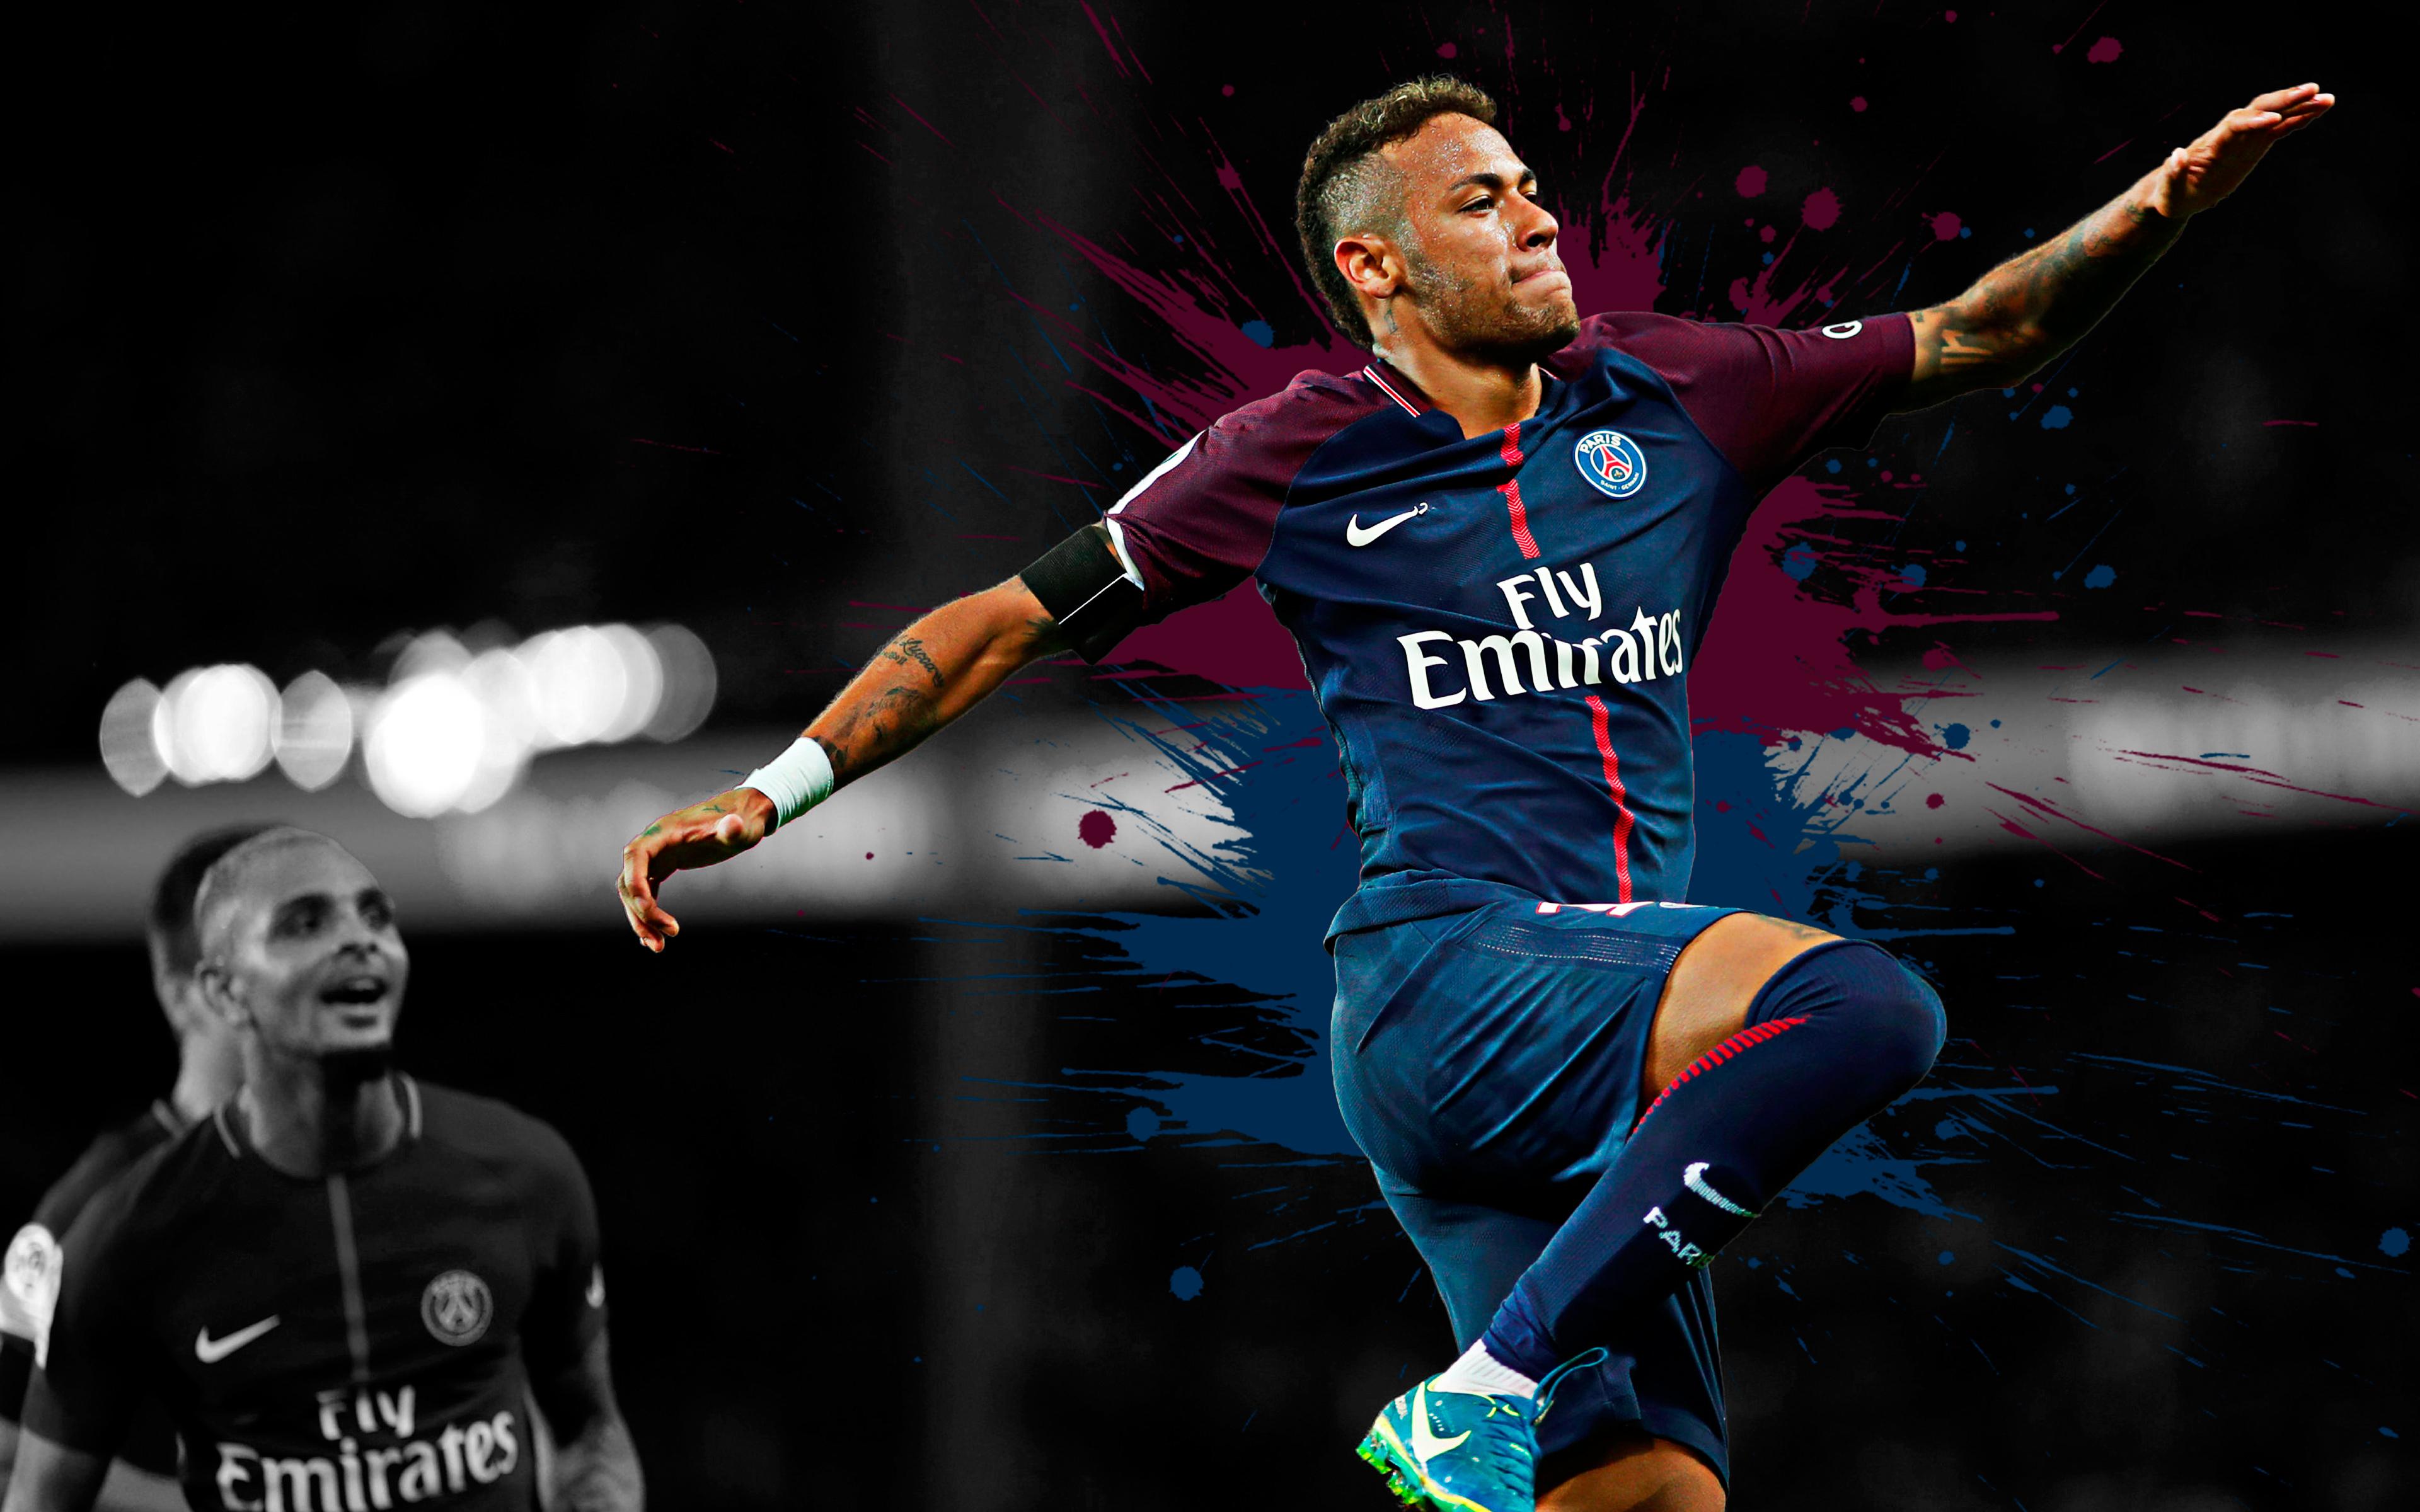 neymar jr psg 4k ultra hd wallpaper